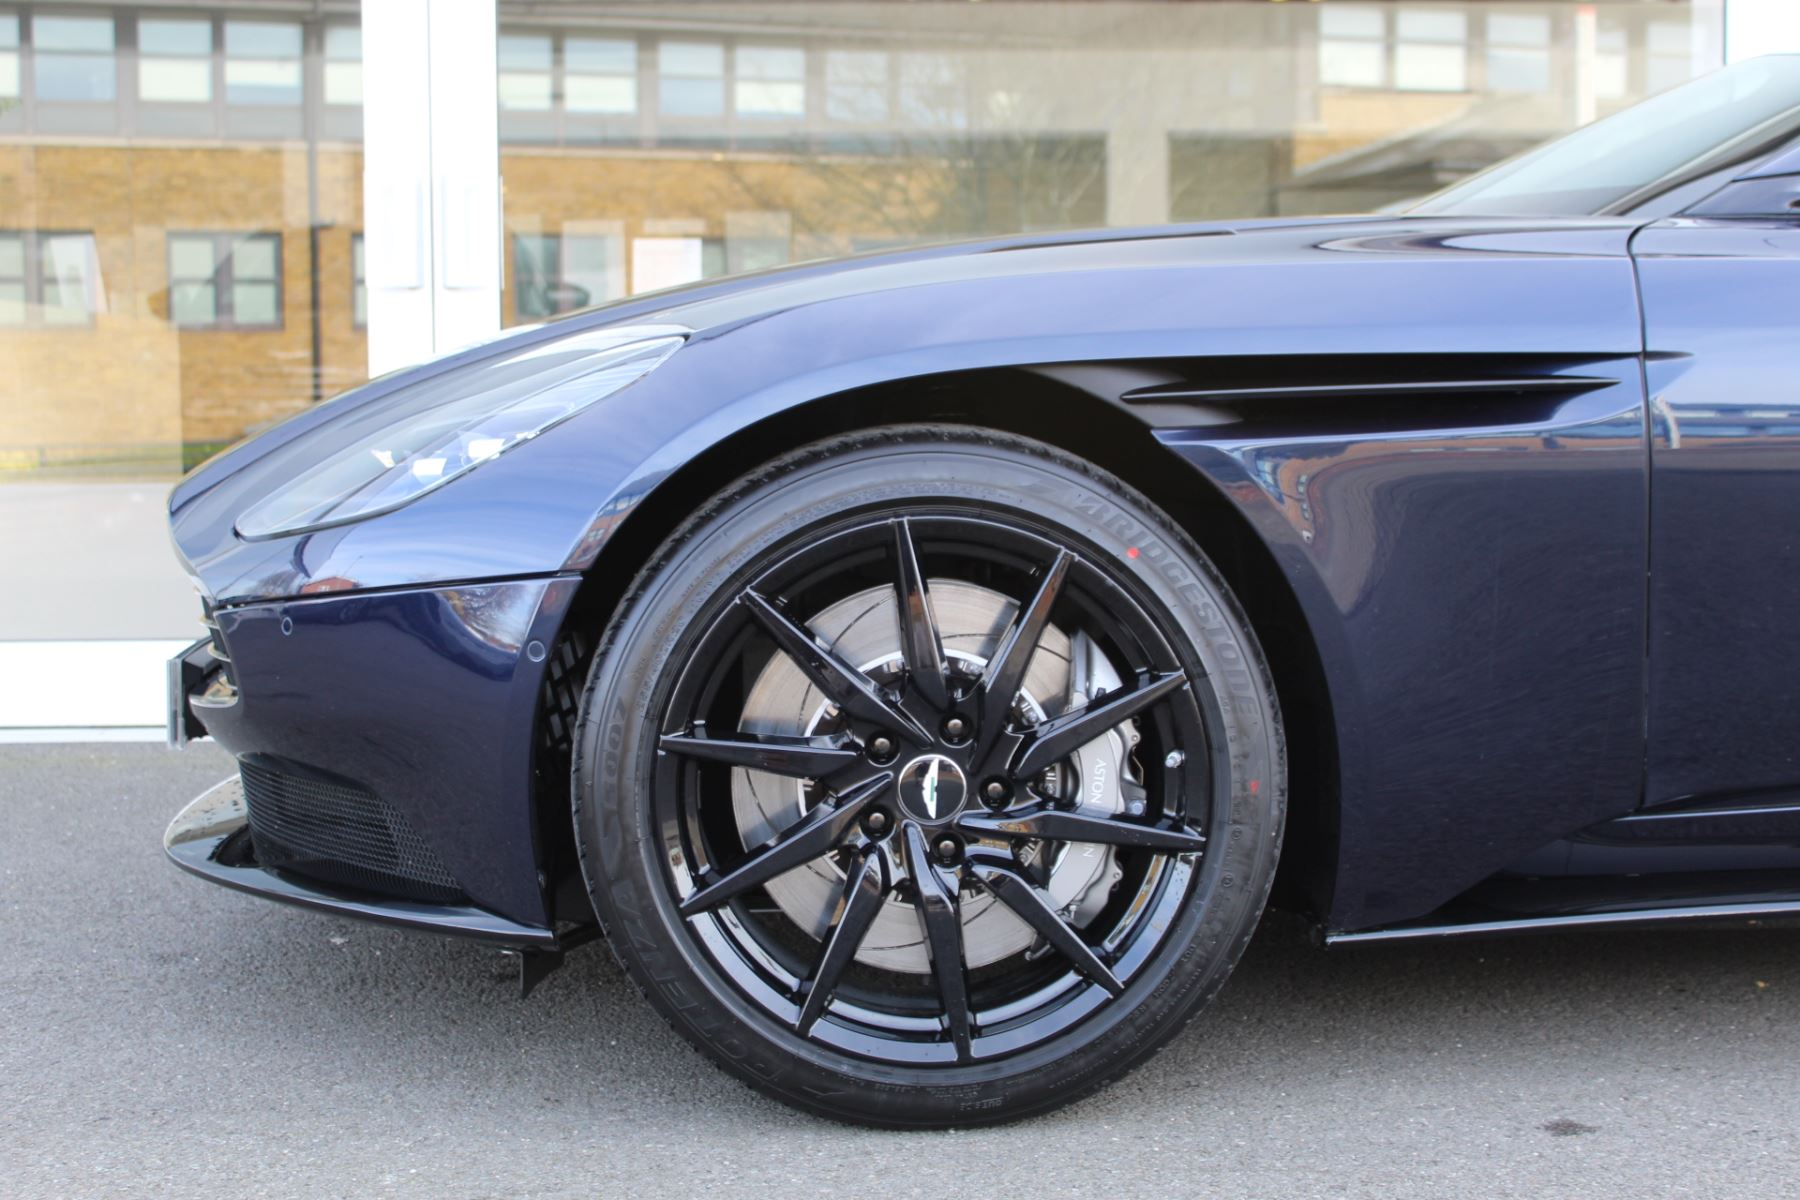 Aston Martin DB11 Volante V8 Volante 2dr Touchtronic image 15